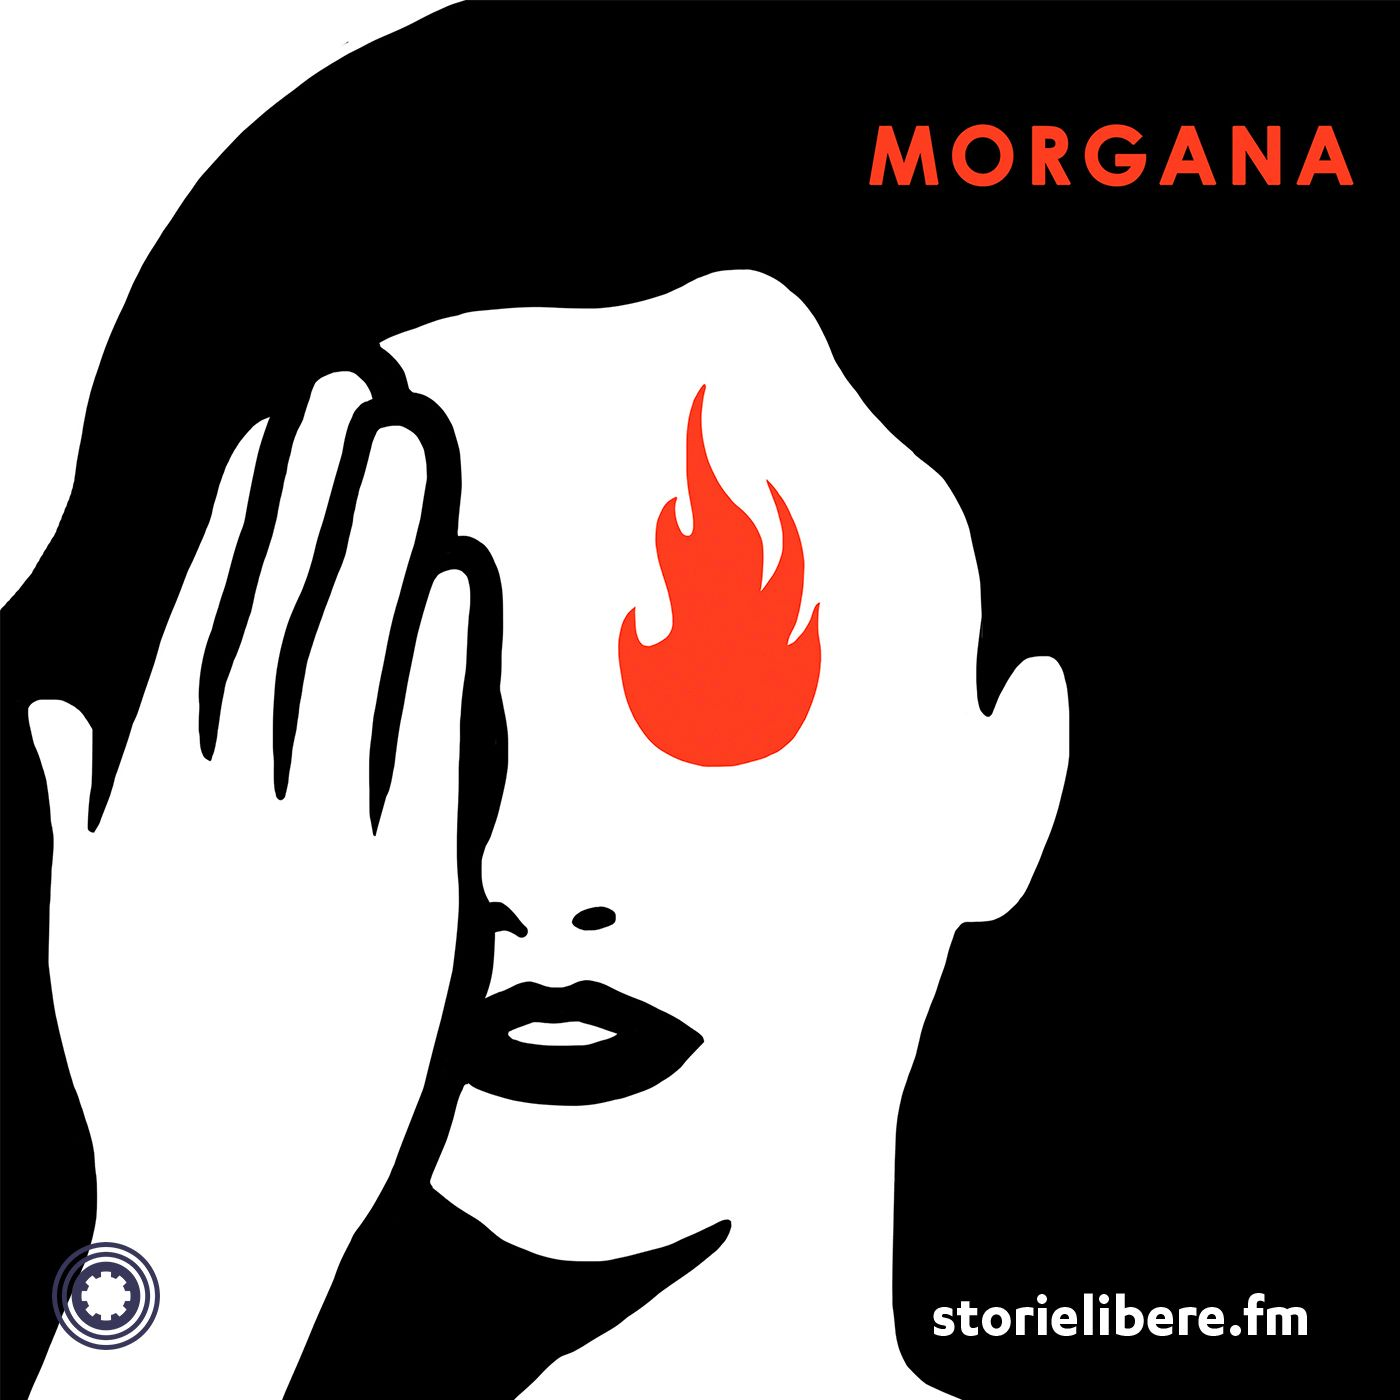 Morgana bonus track